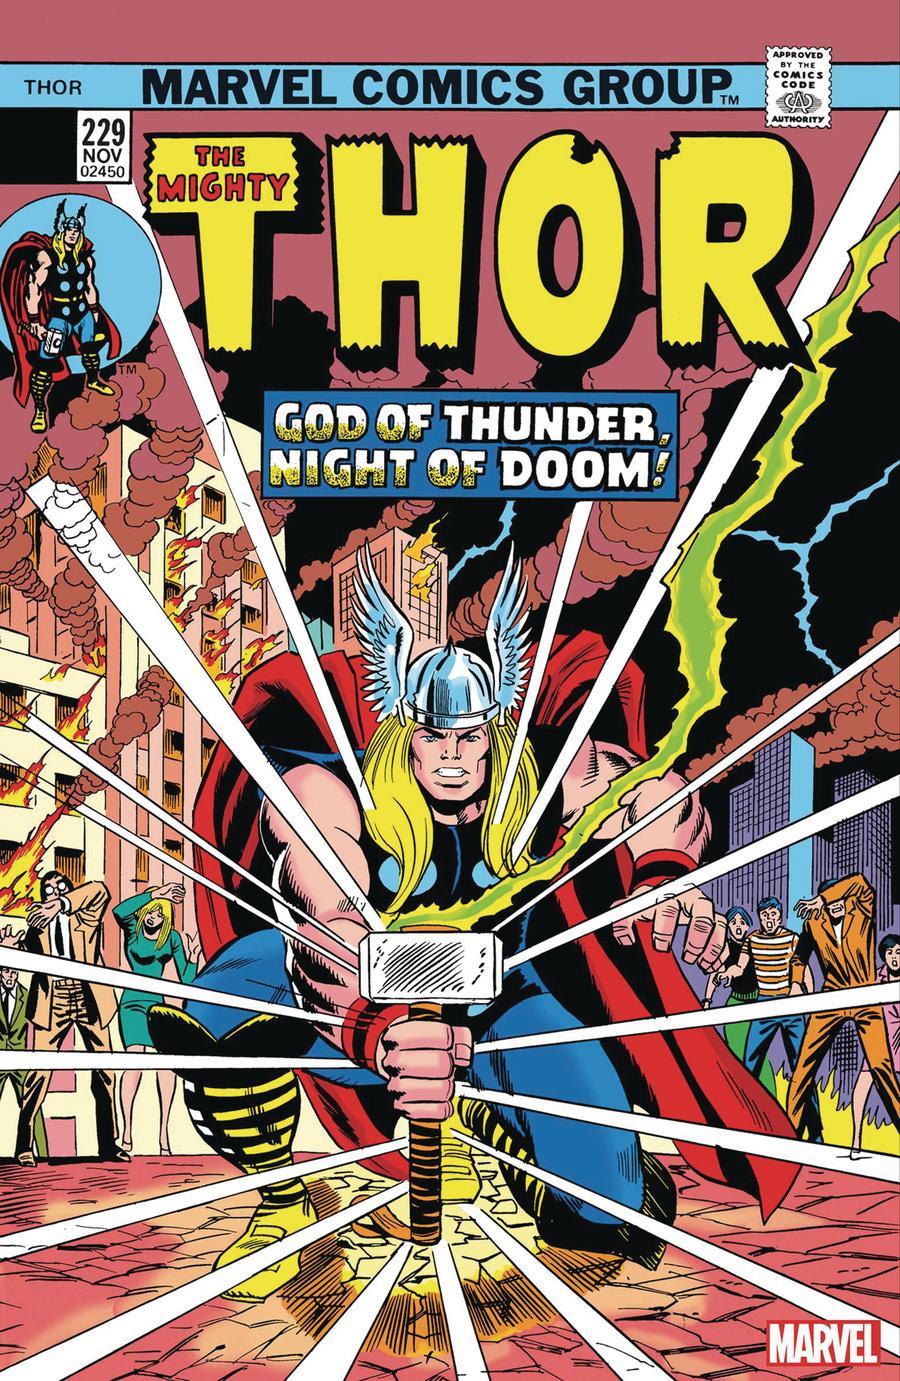 Thor Vol 1 #229 Cover B Facsimile Edition